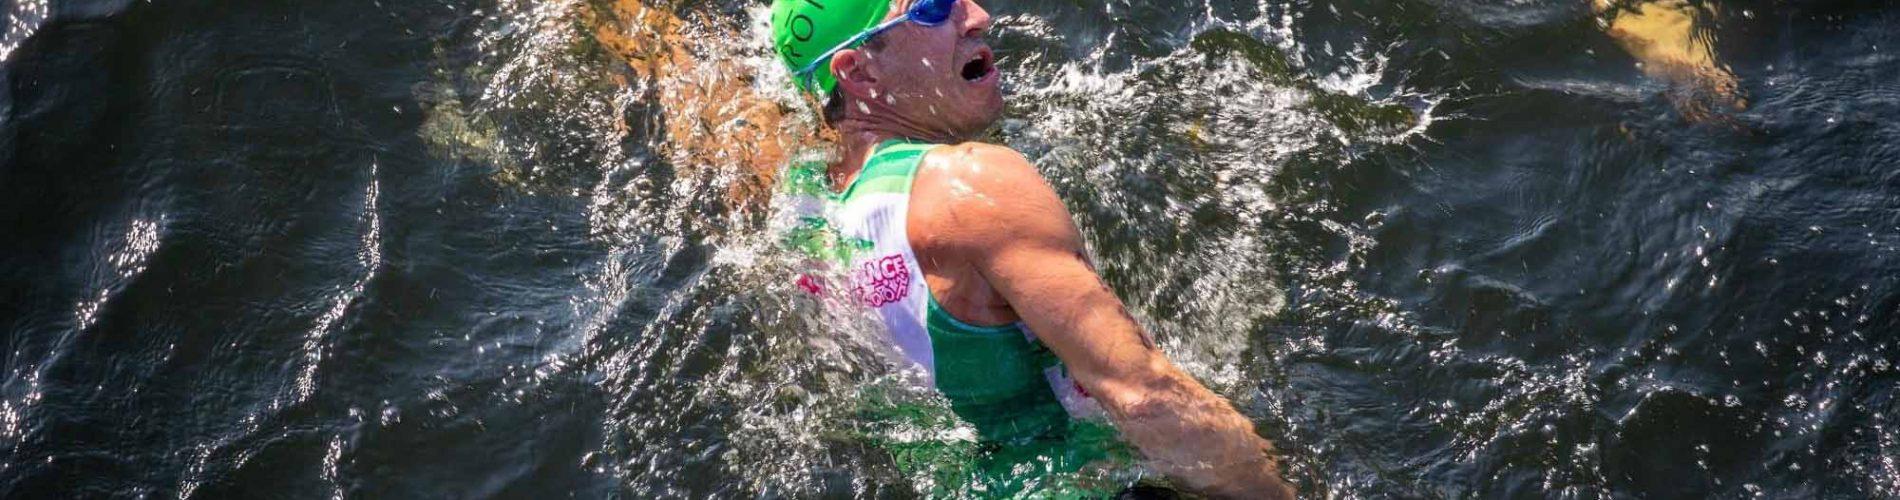 charlestonsportsmassage.com male swimmer